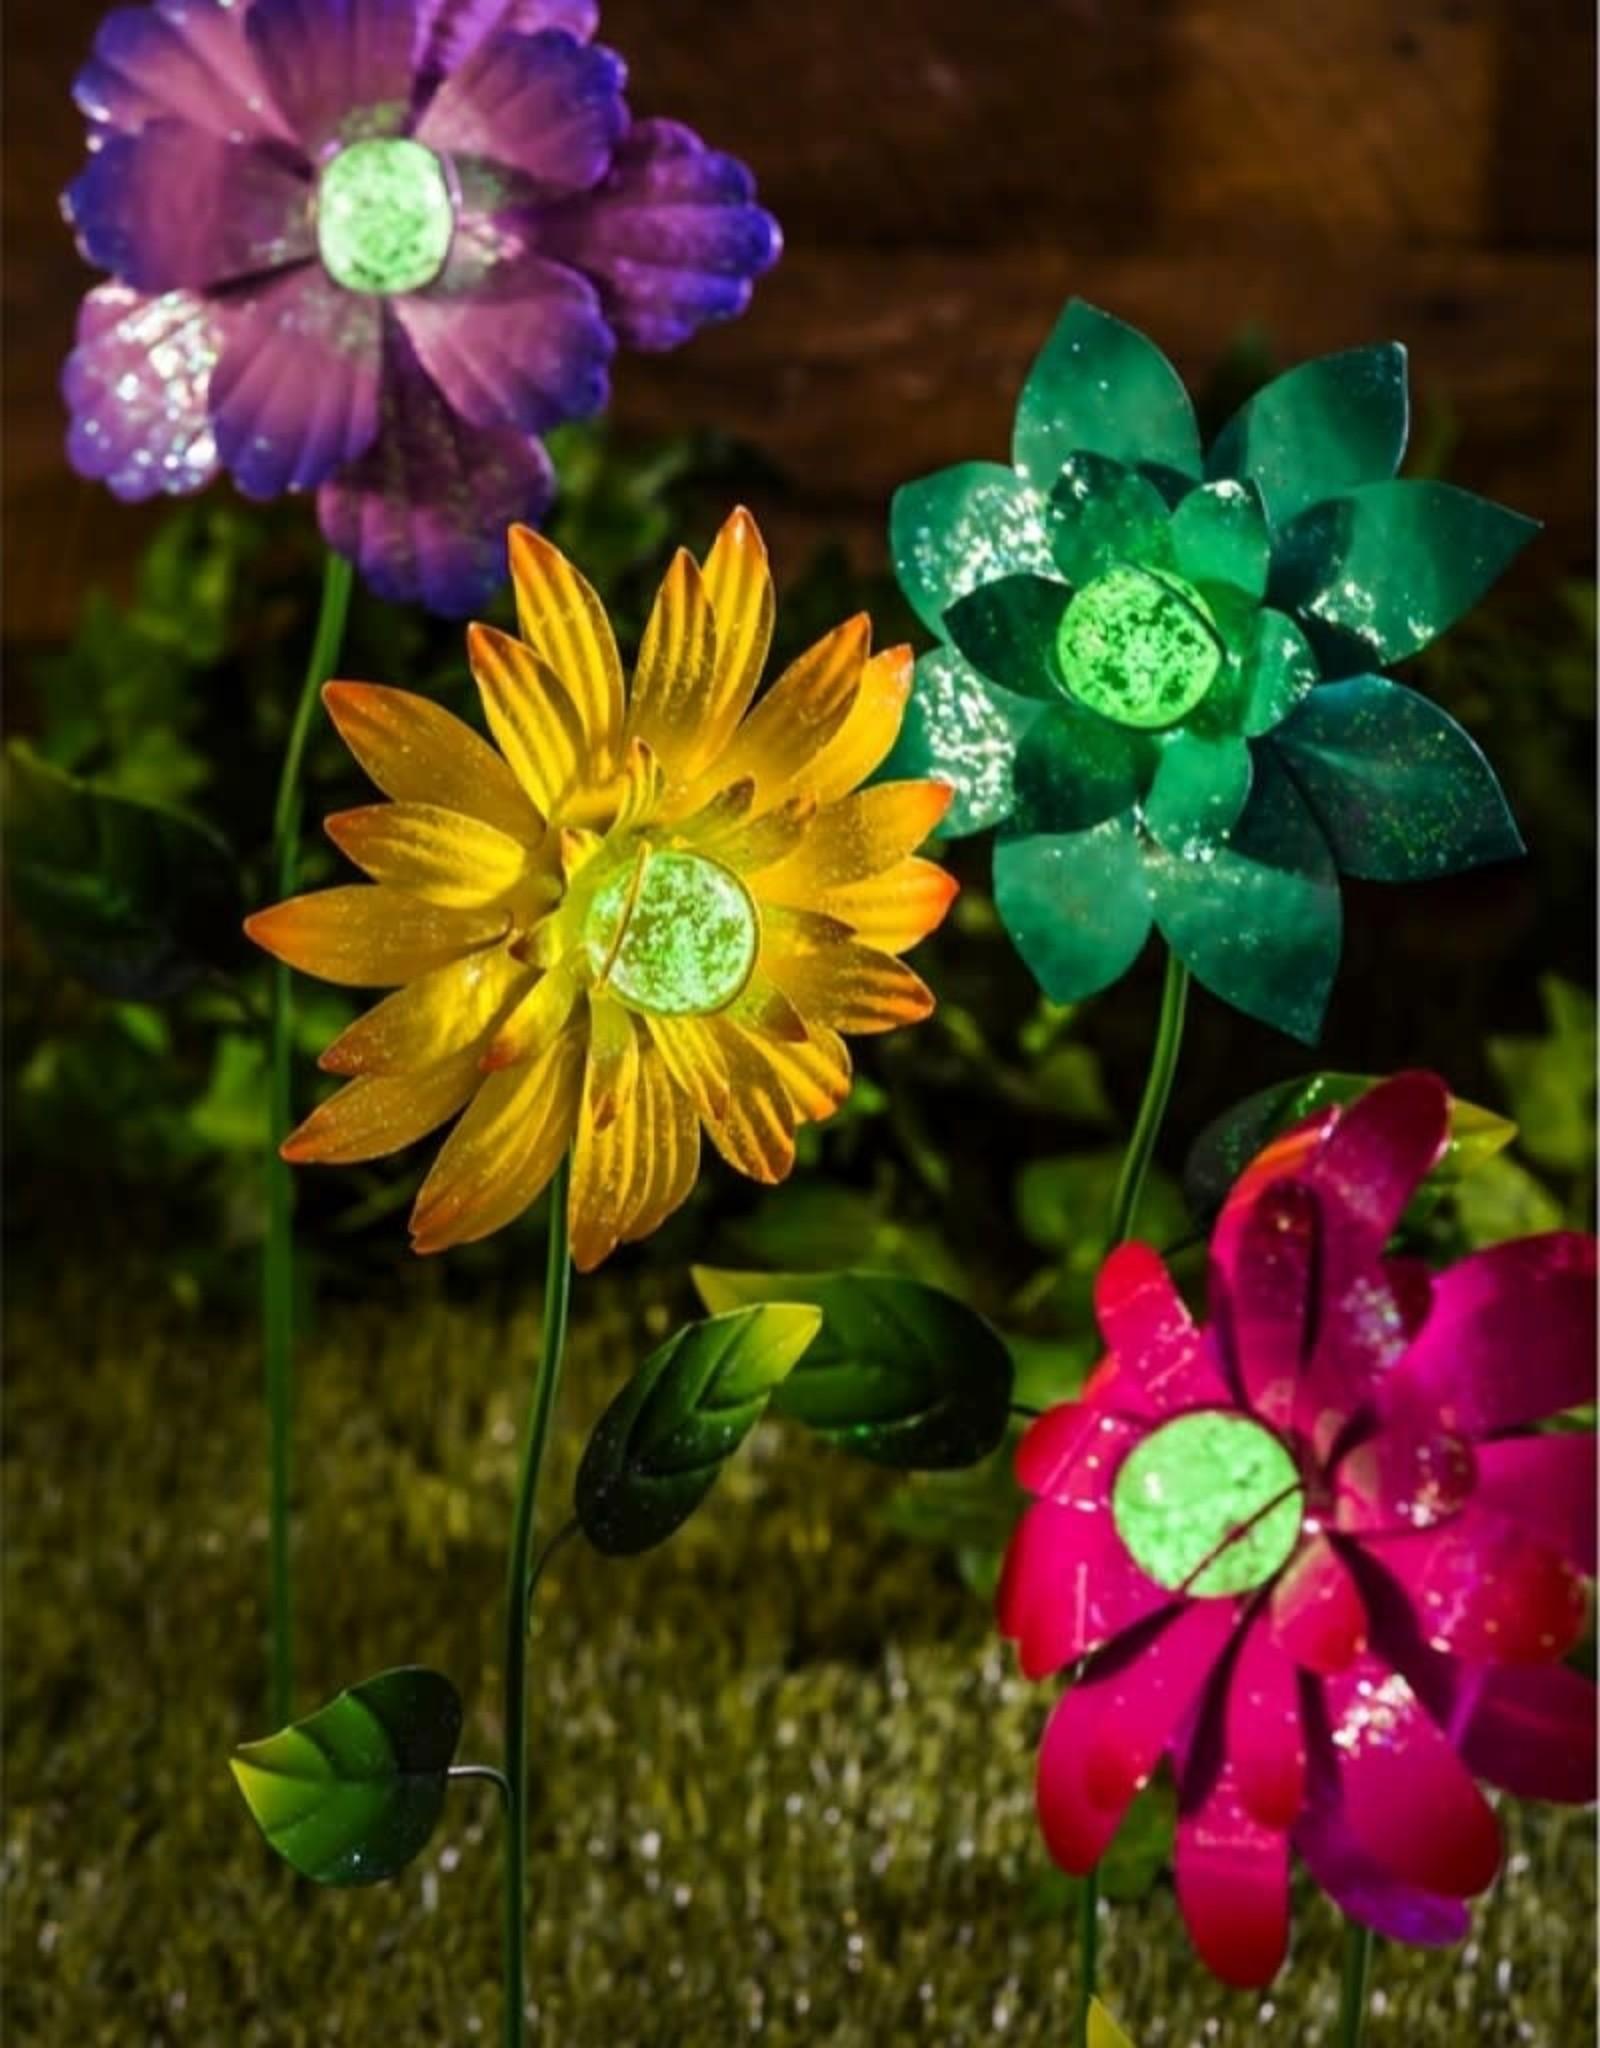 Colorful Glow in the Dark Metal Flower Stake - Purple